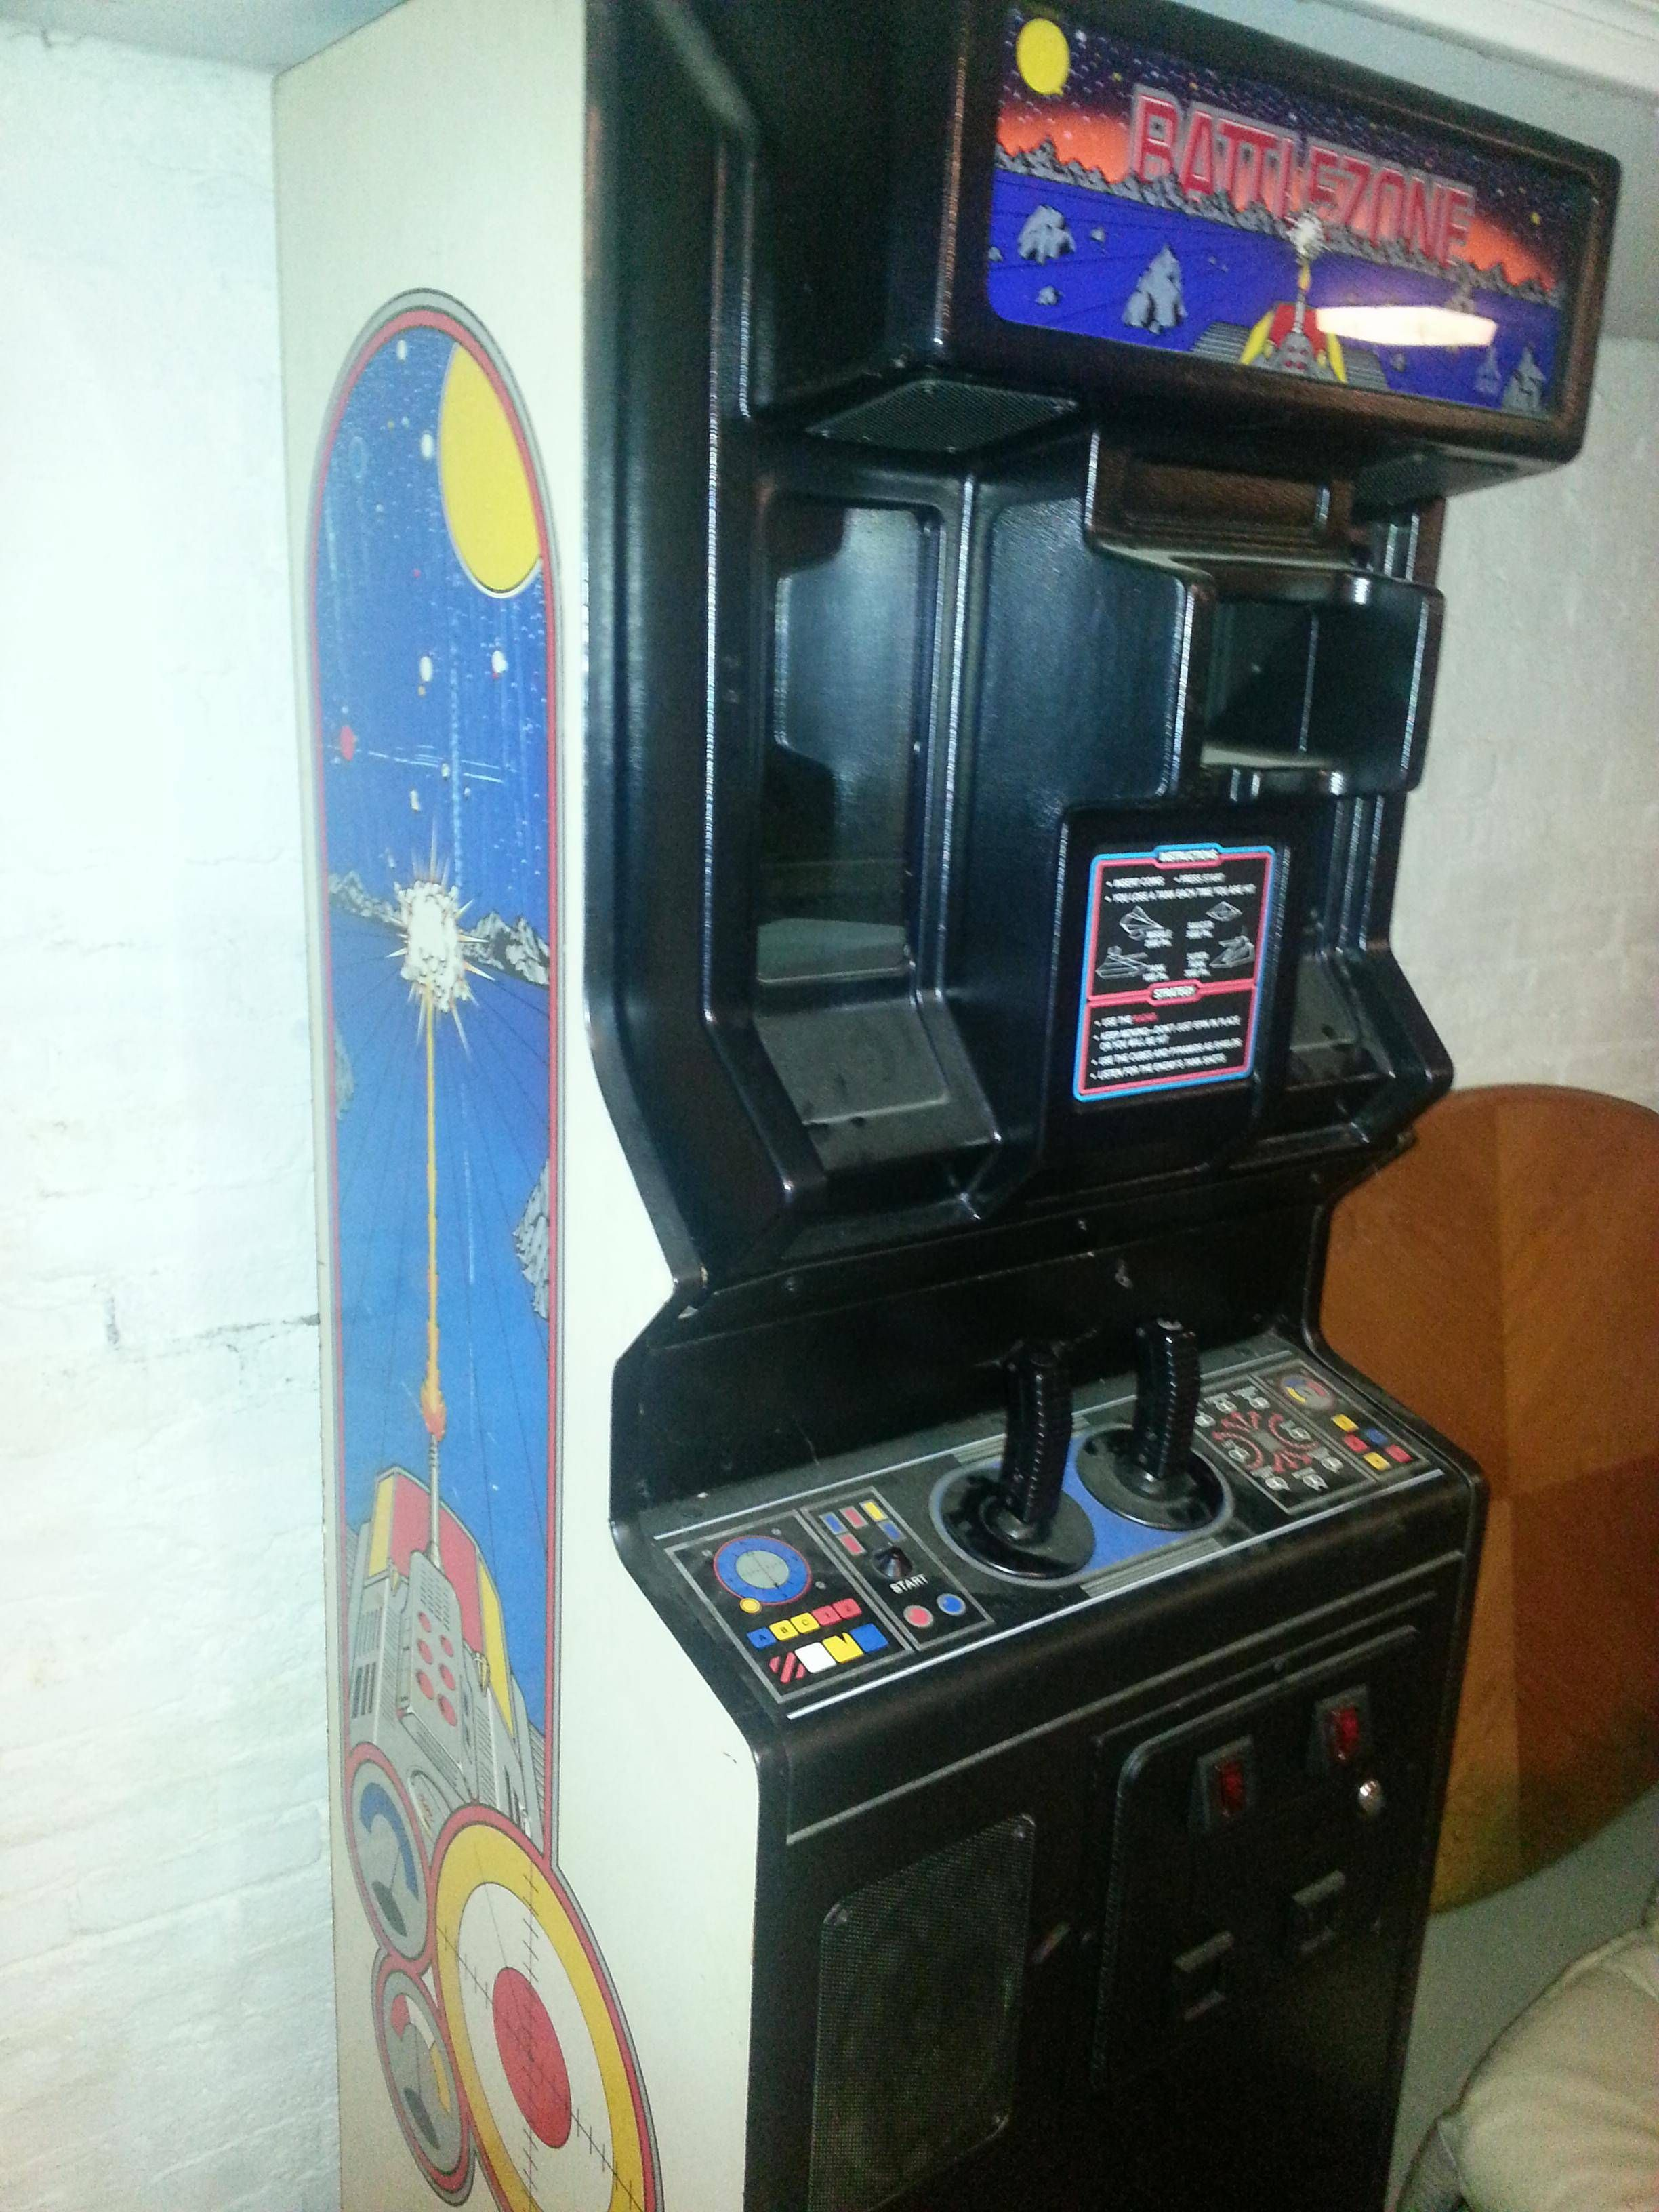 1942 Arcade Cabinet Star Wars Arcade Machine Google Search Arcade Cabinets